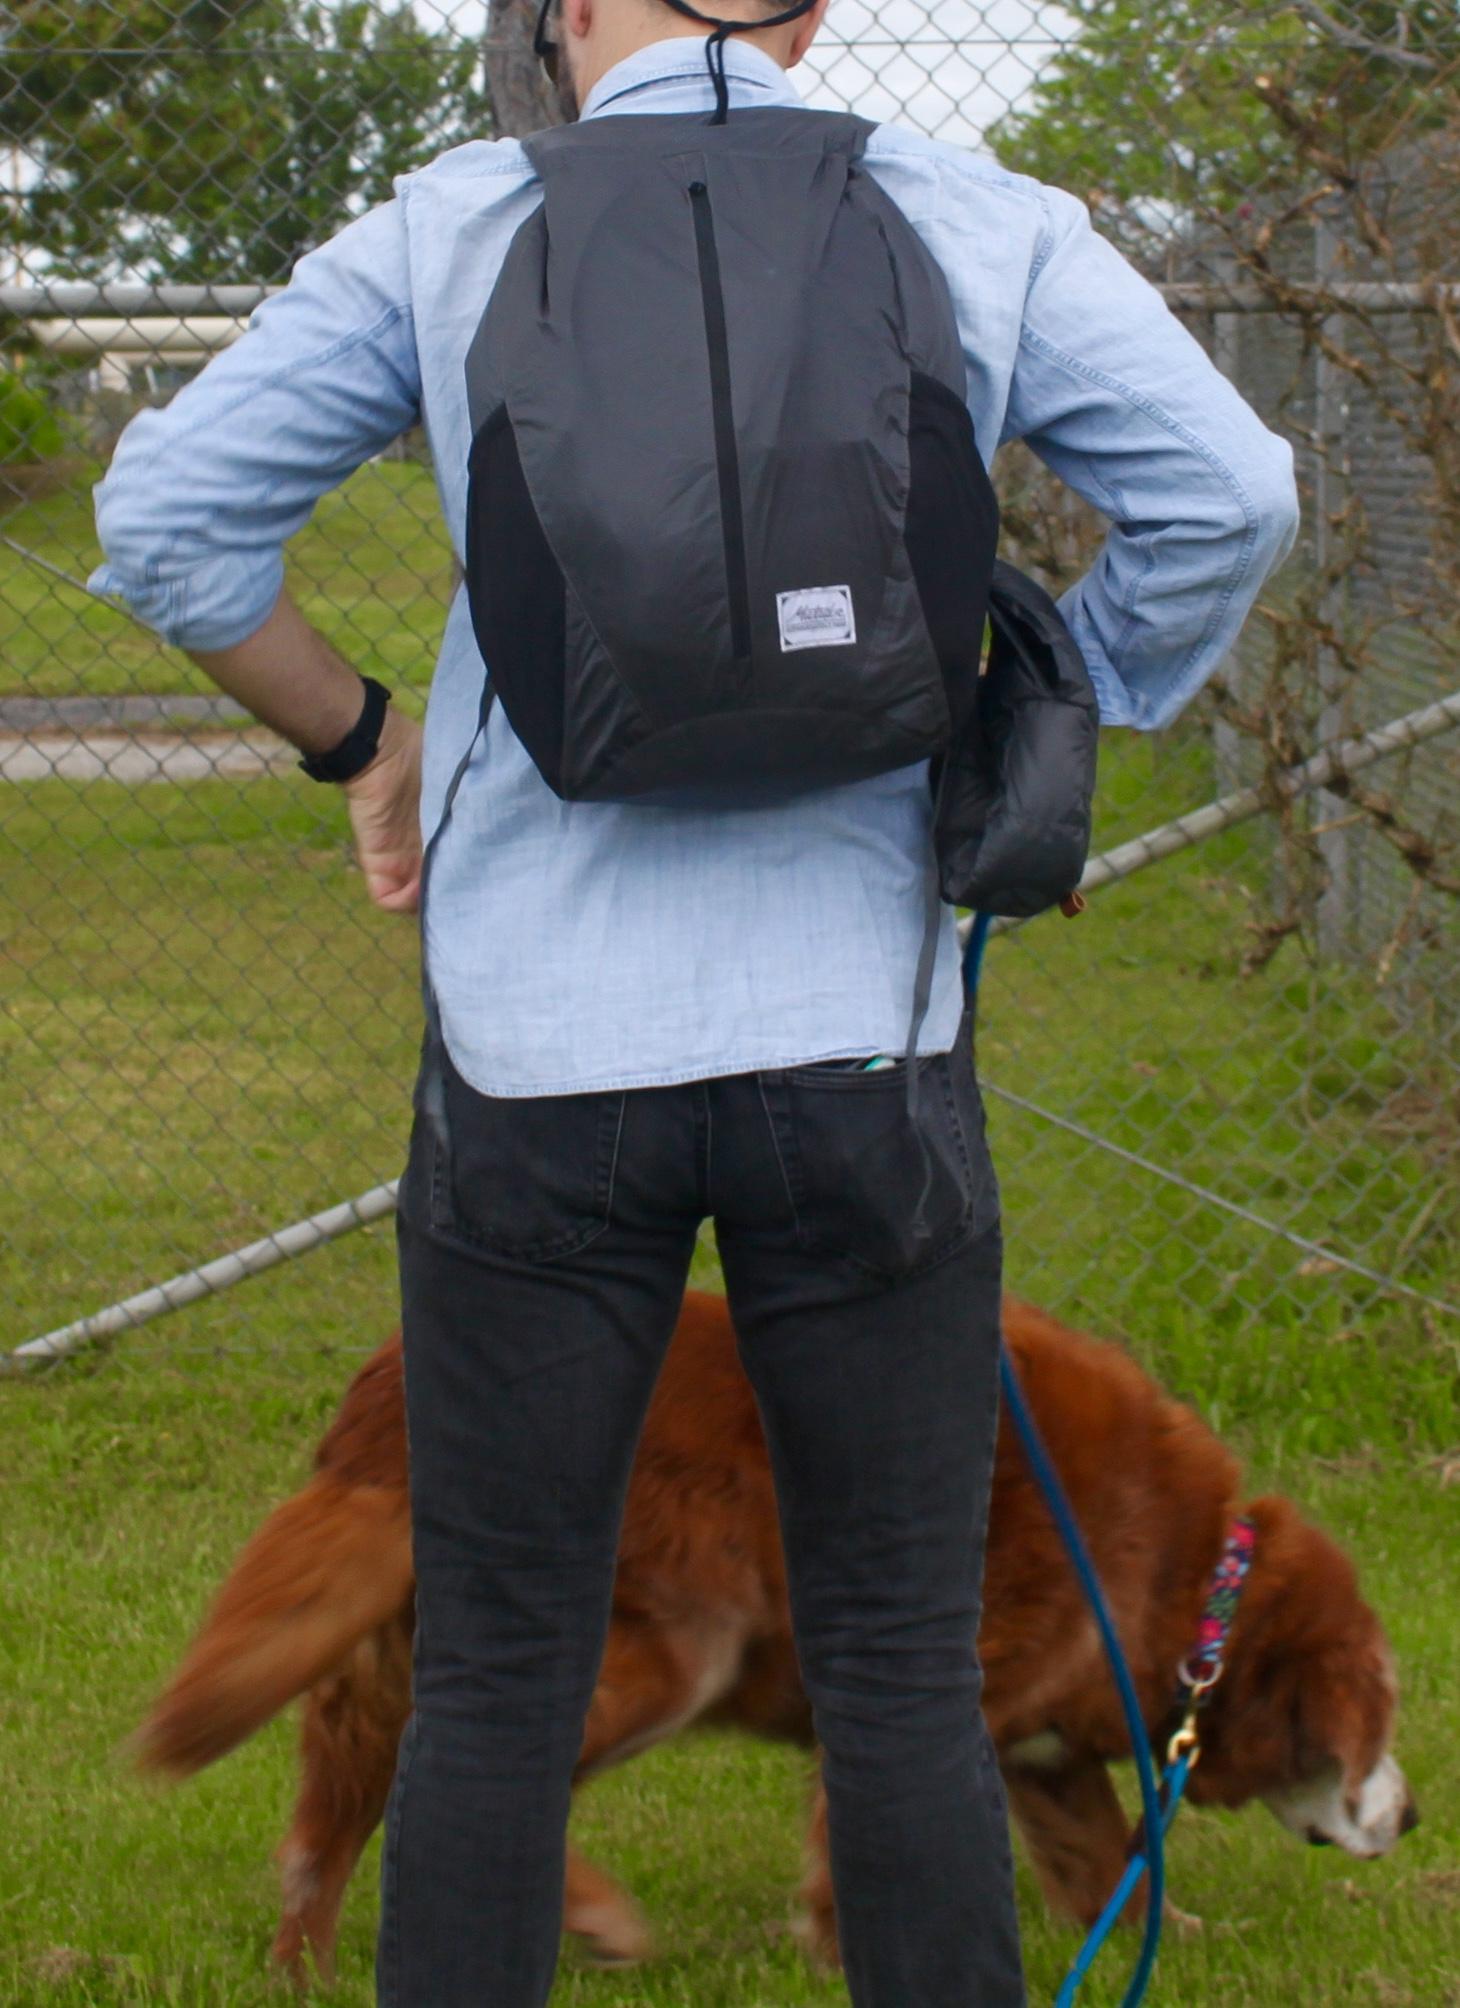 Matador Freerain24 Backpack: $59.99